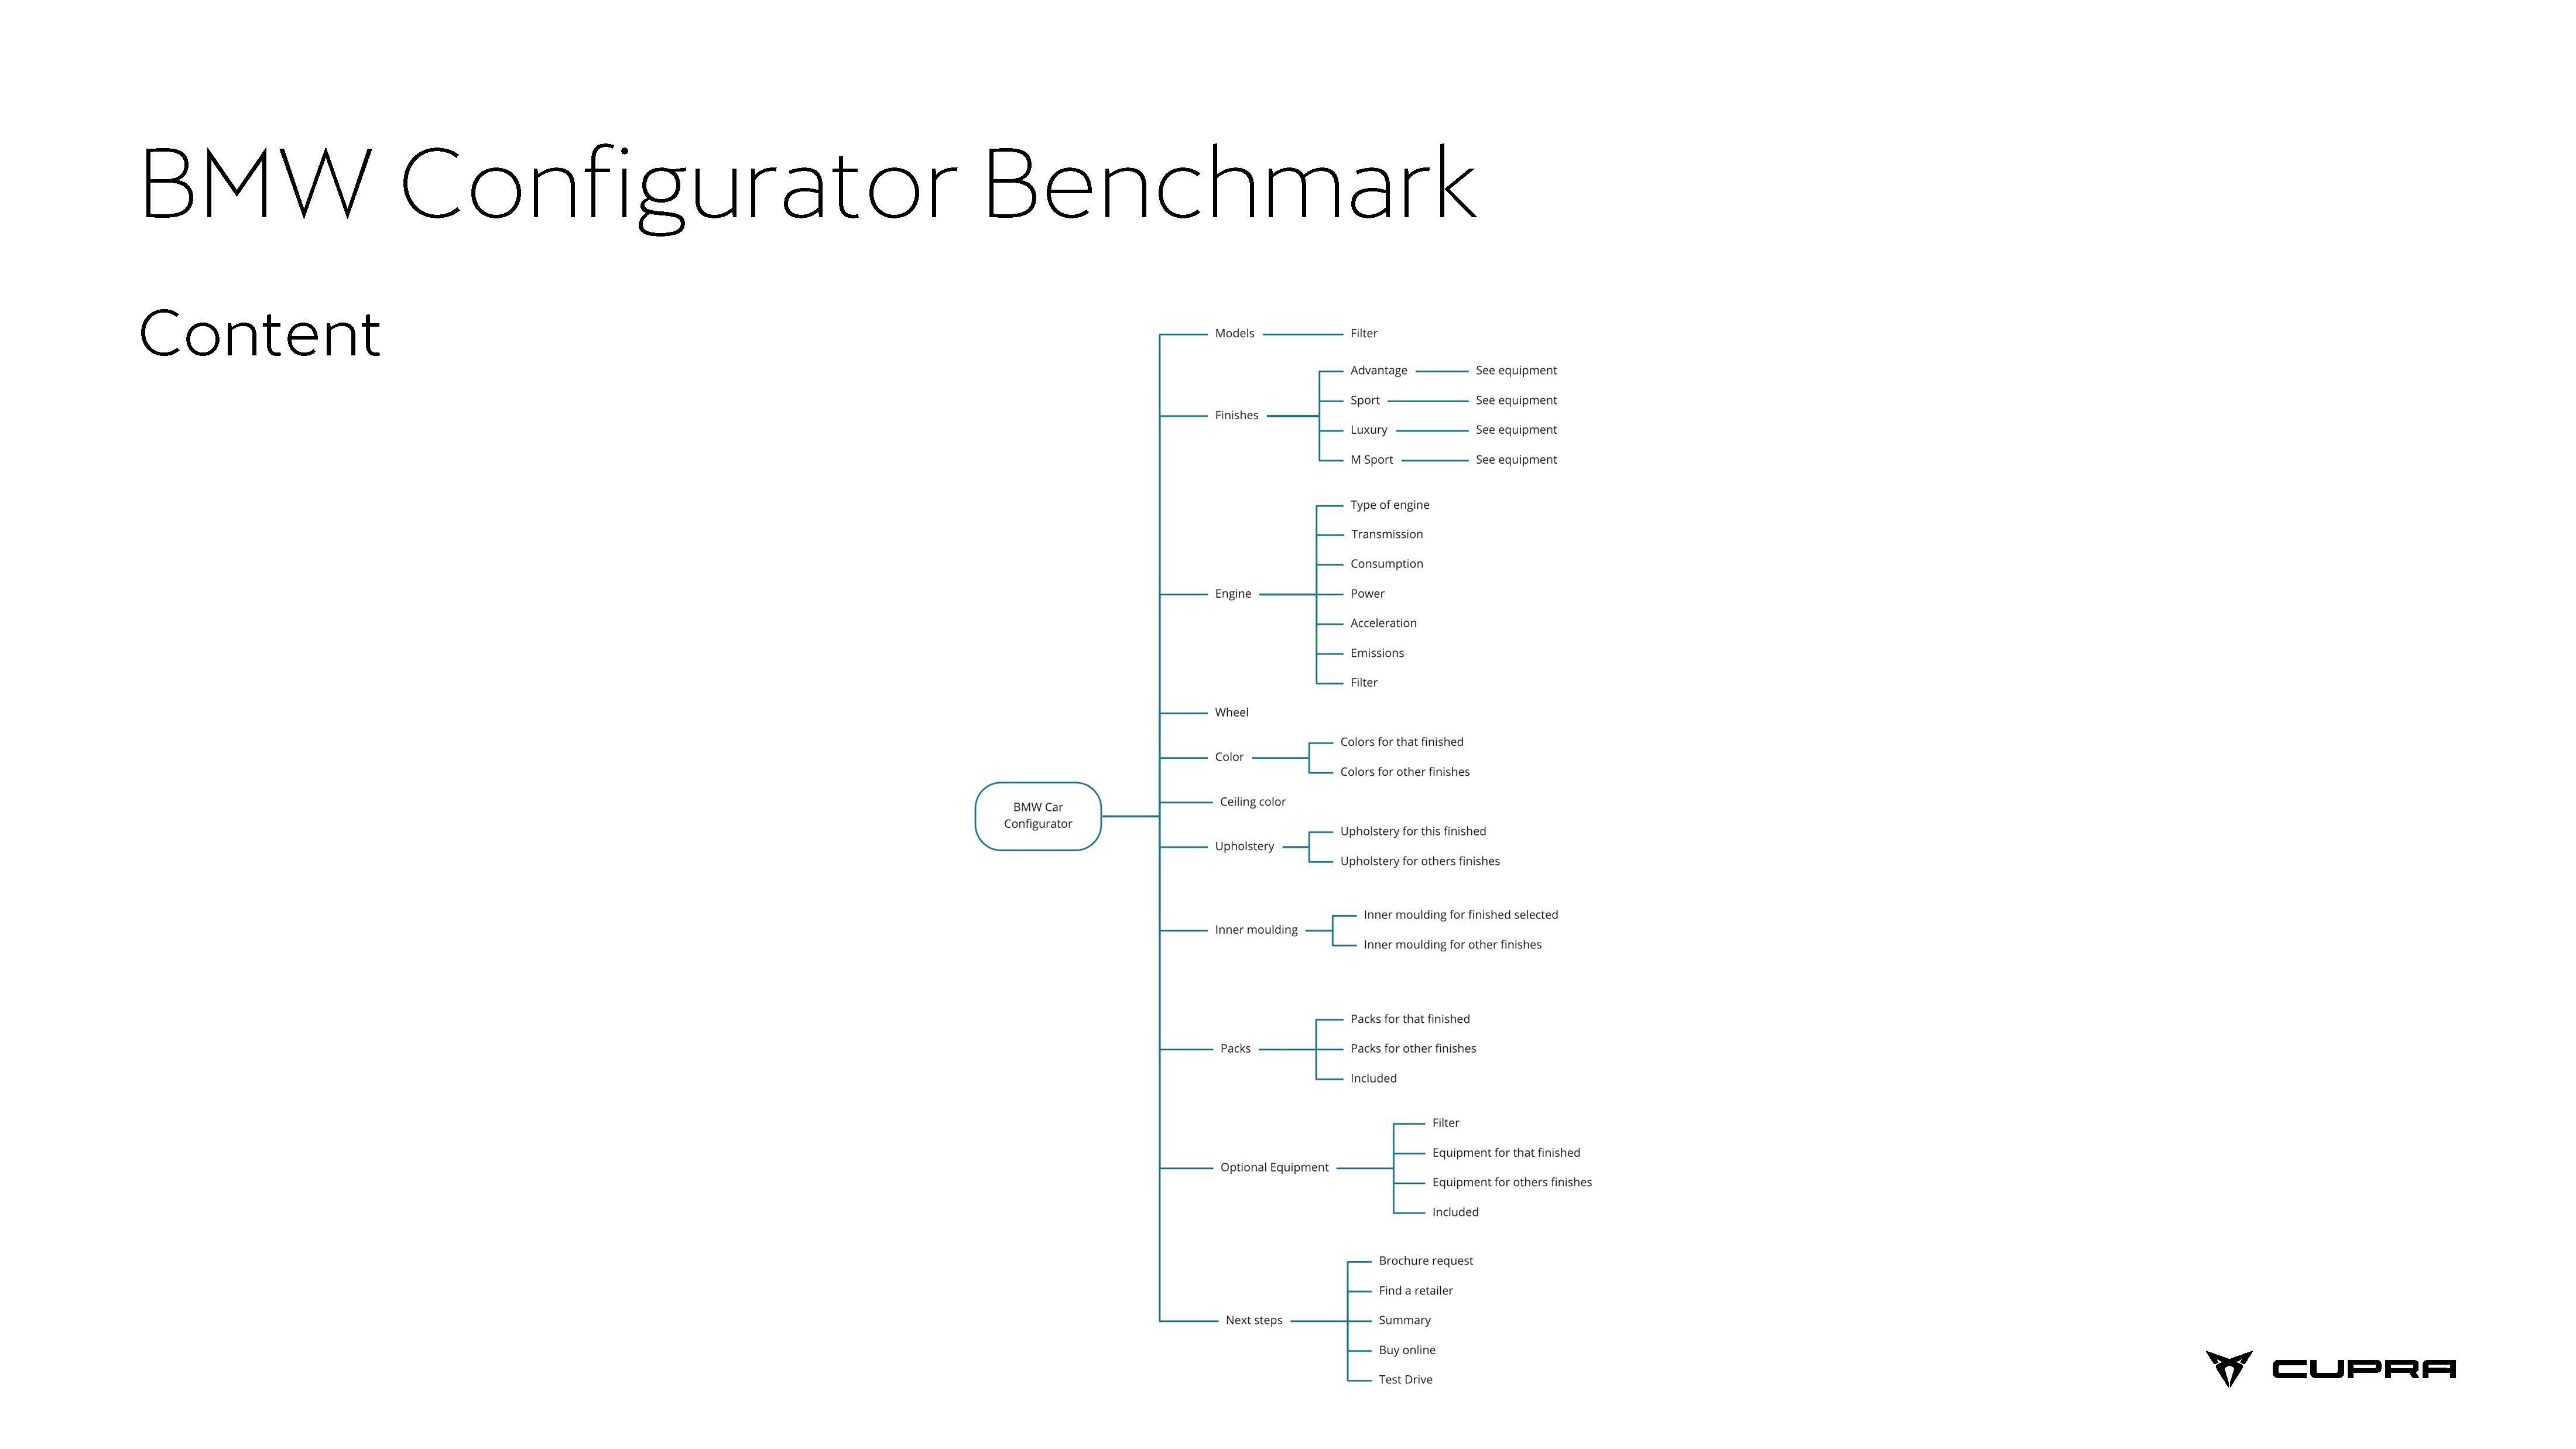 Benchmarking Car Configurator_Página_12